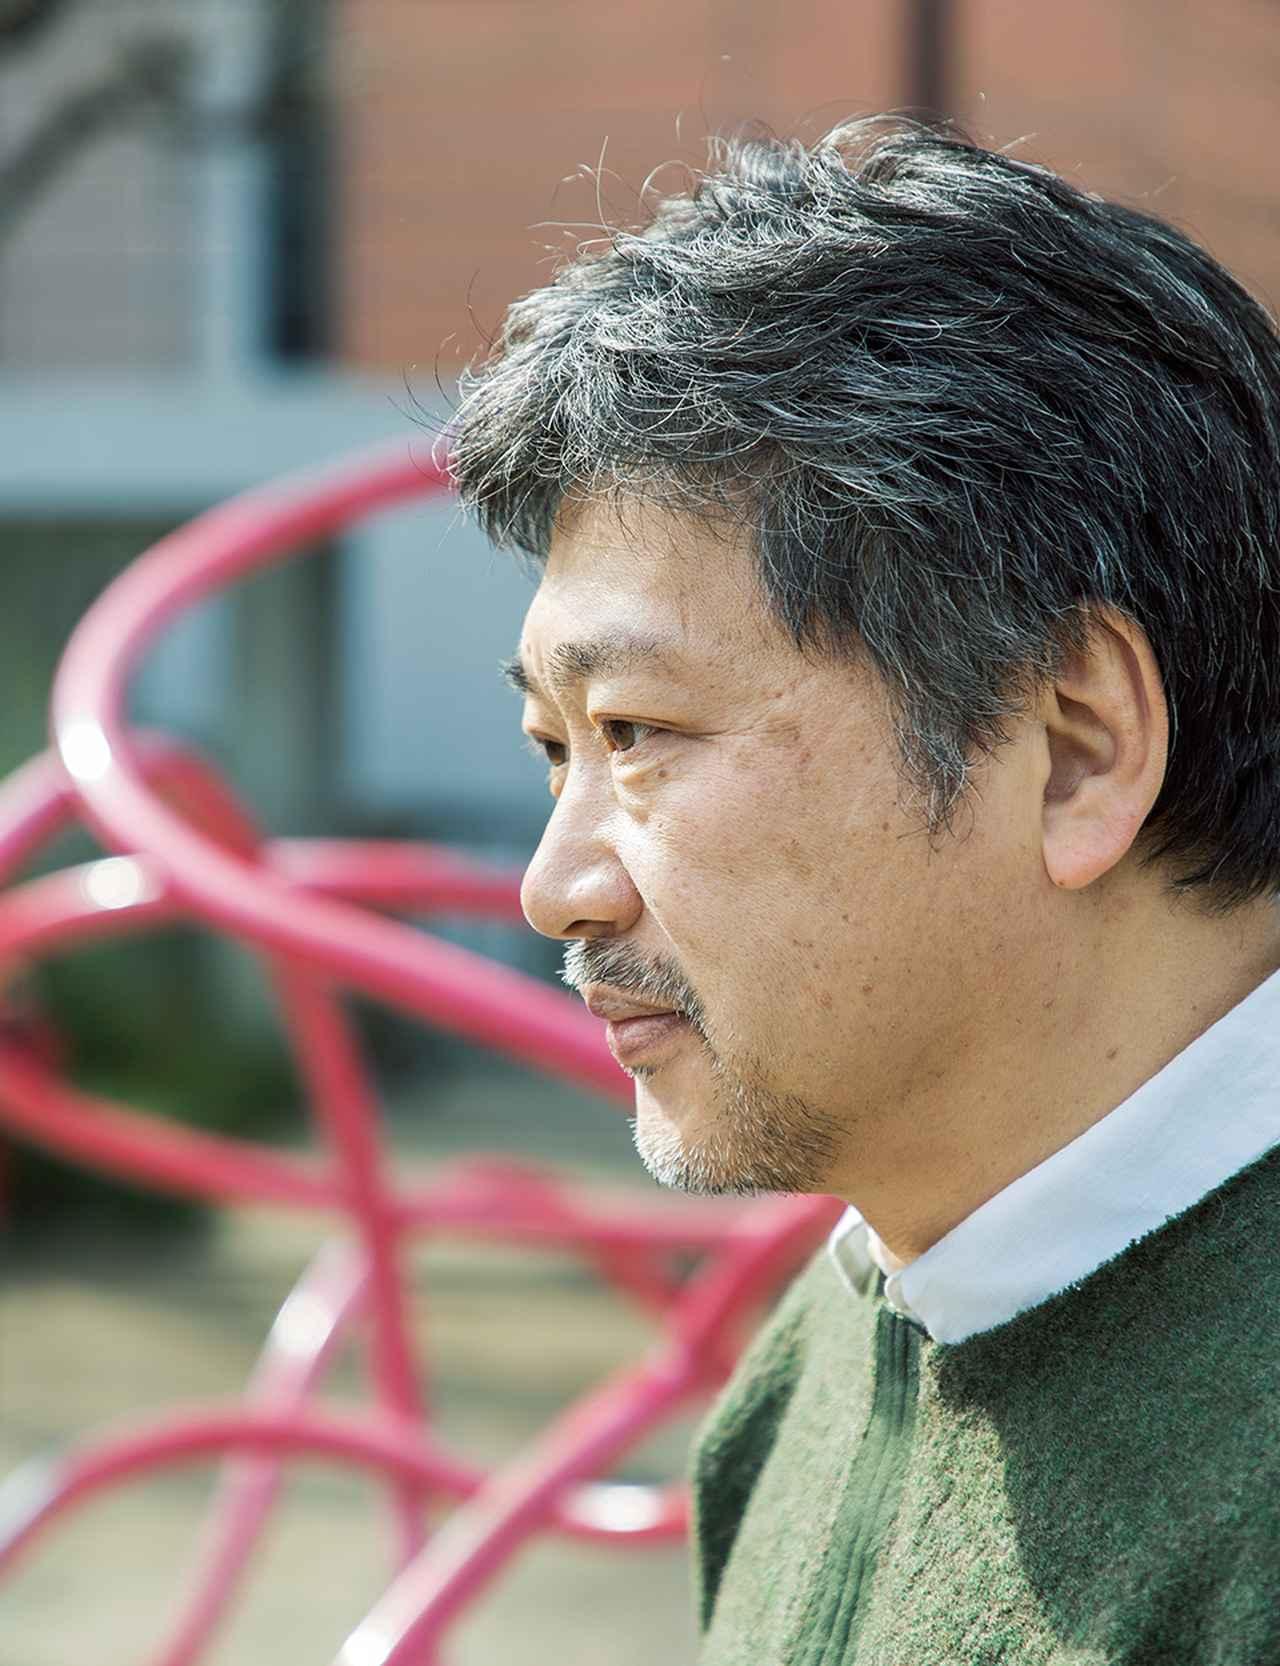 Images : 3番目の画像 - 「見えざる人々を見る。 映画監督・是枝裕和インタビュー」のアルバム - T JAPAN:The New York Times Style Magazine 公式サイト